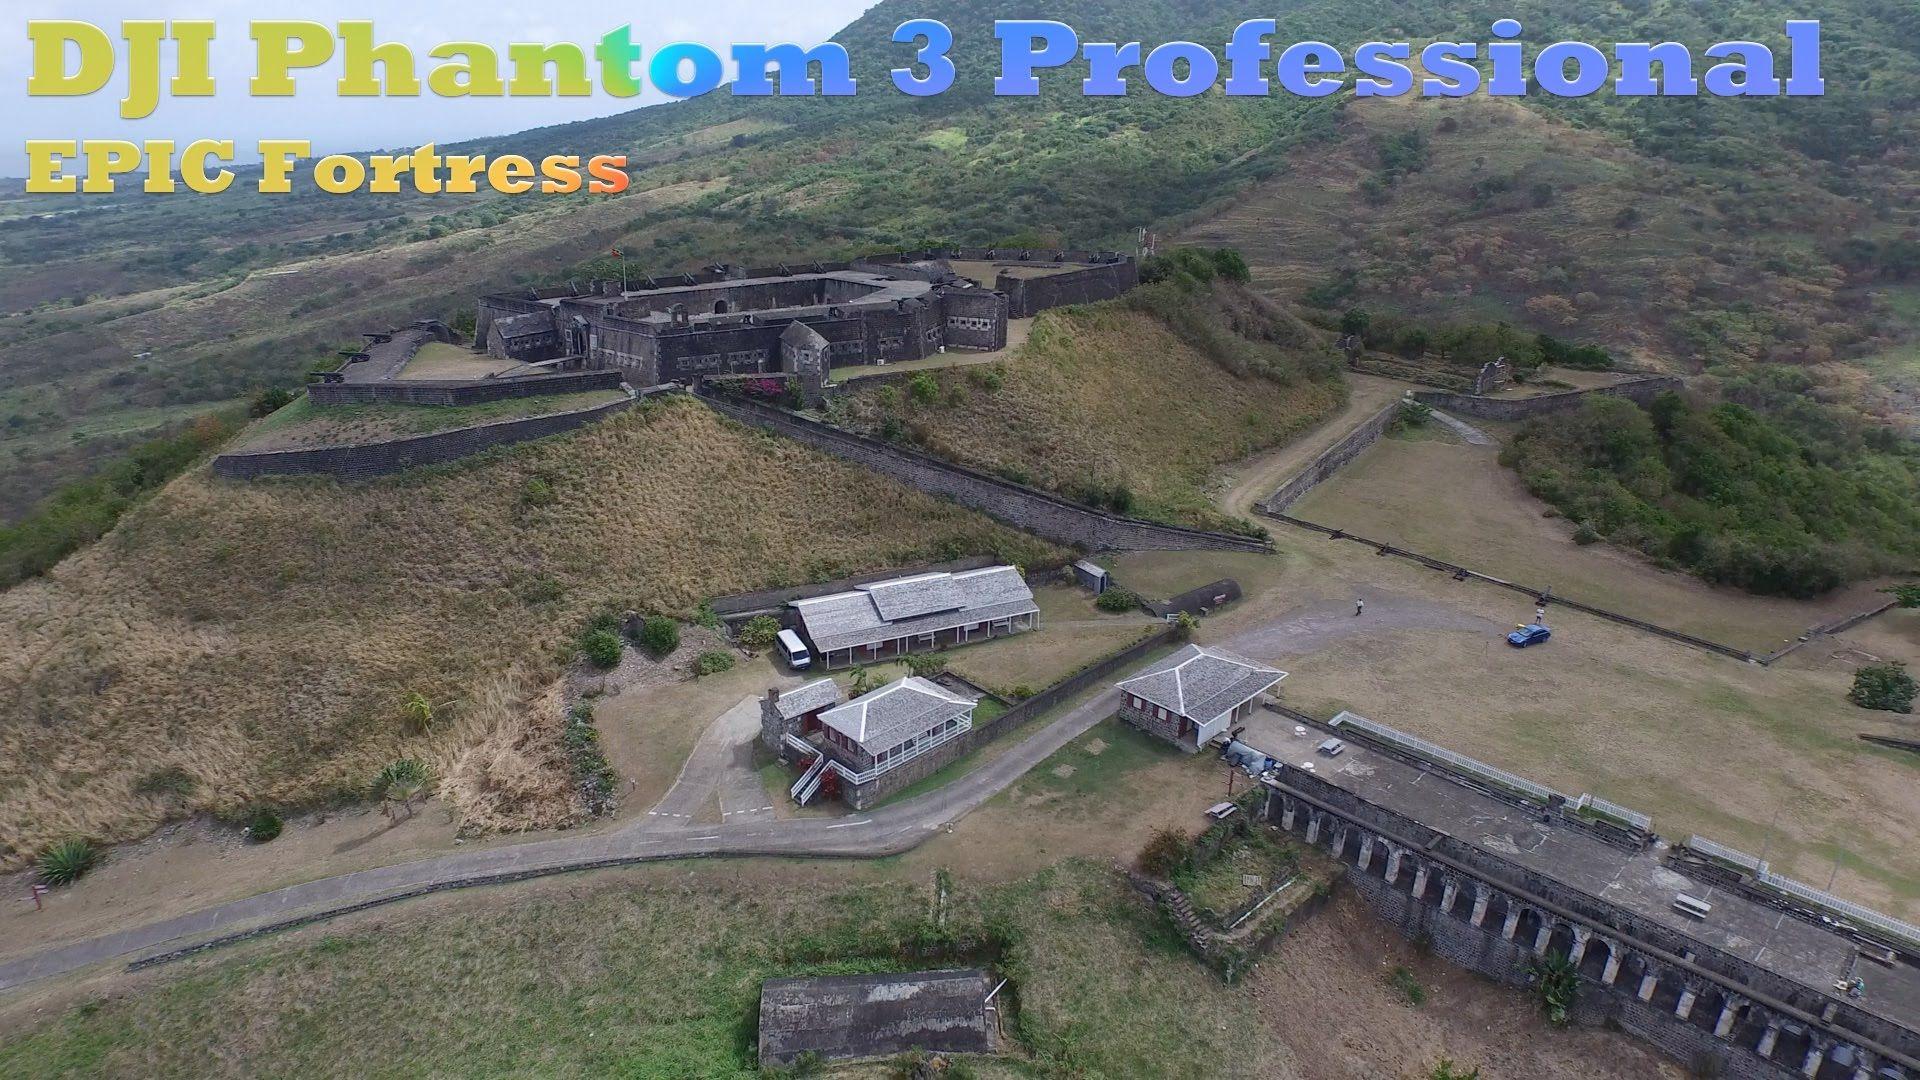 DJI Phantom 3 EPIC Fortress in 4K UltraHD